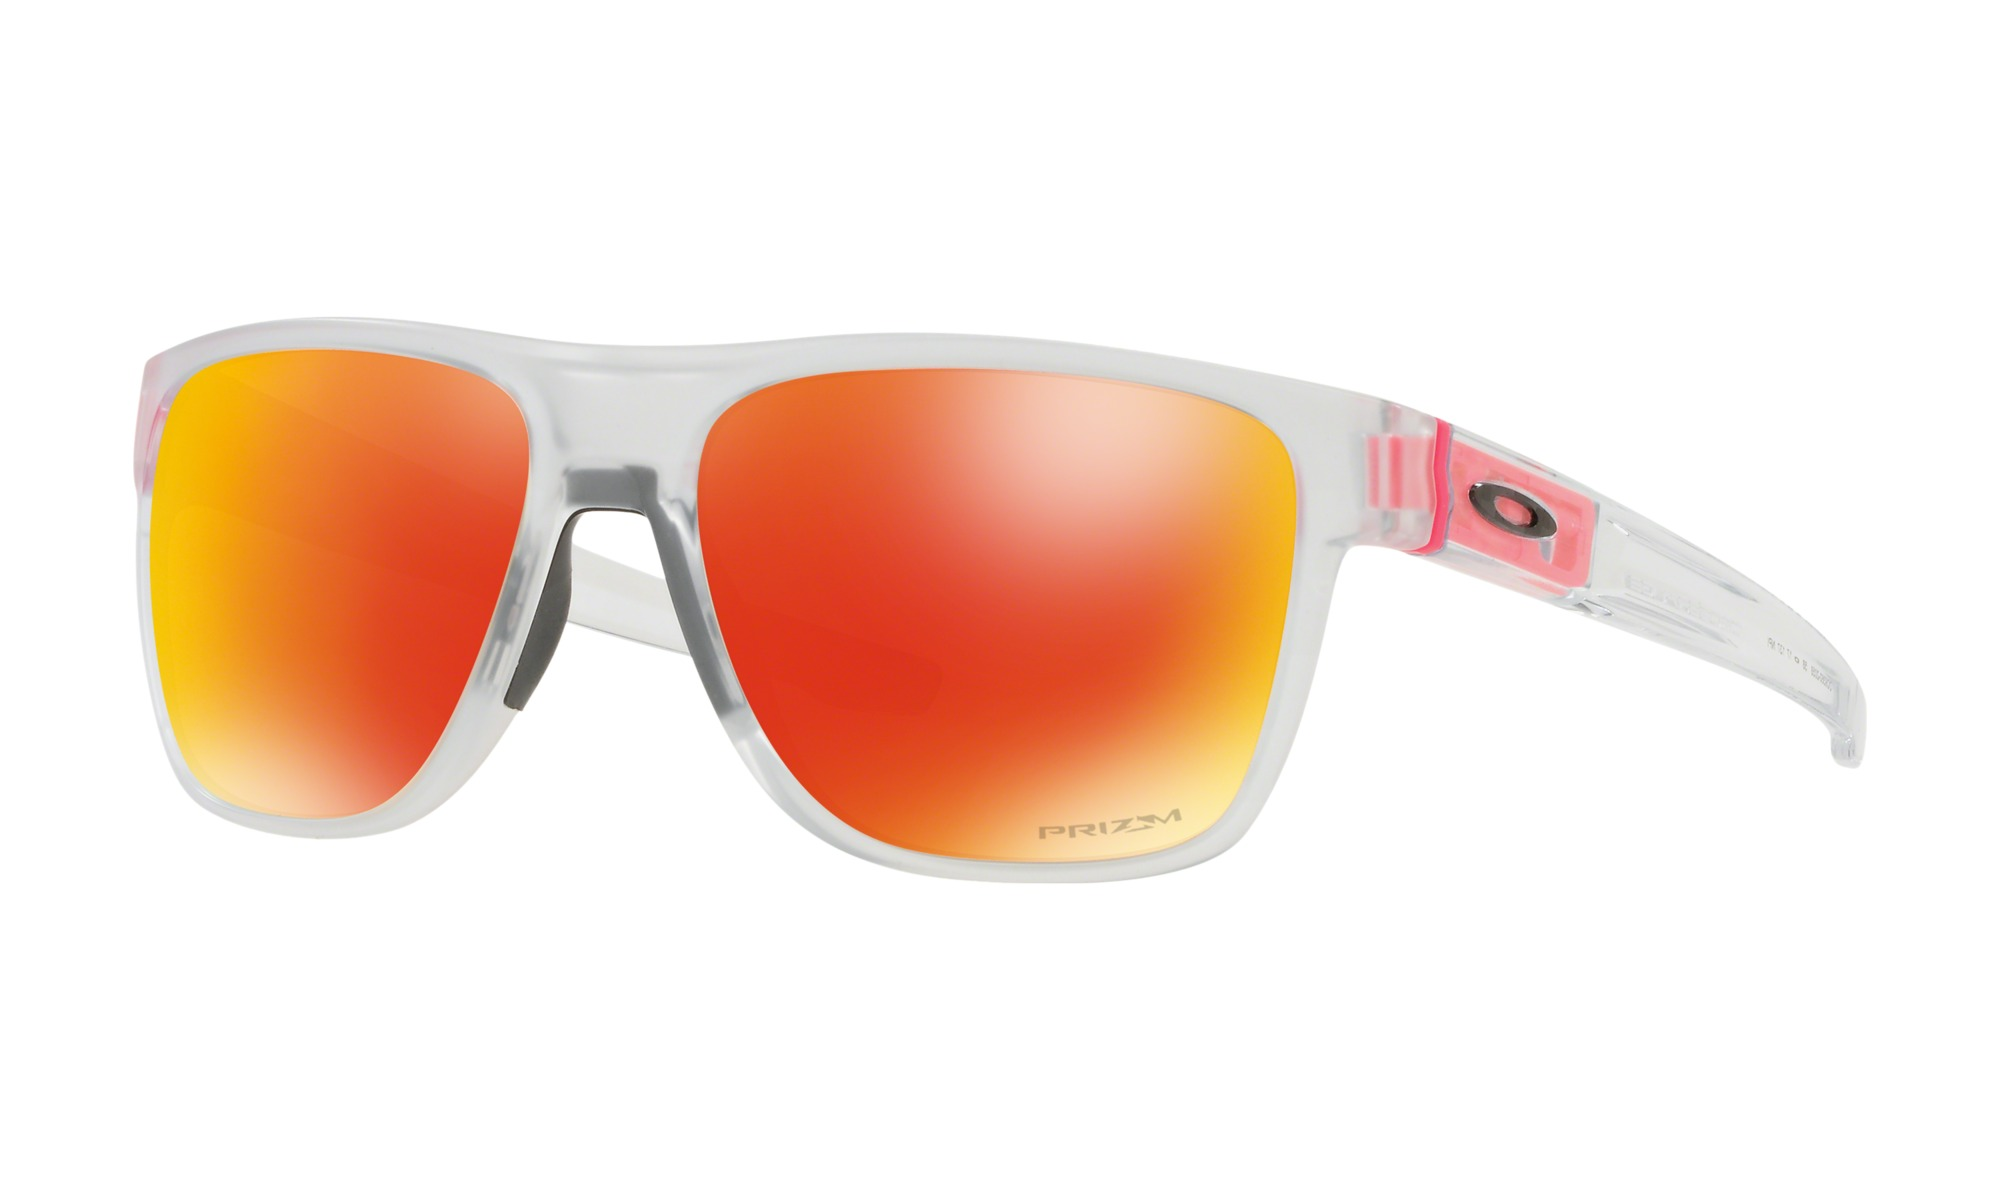 5a156effbb Oakley Sunglasses Crossrange XL Crystal Pop Matte Clear   Prizm Ruby   Ref.  OO9360-